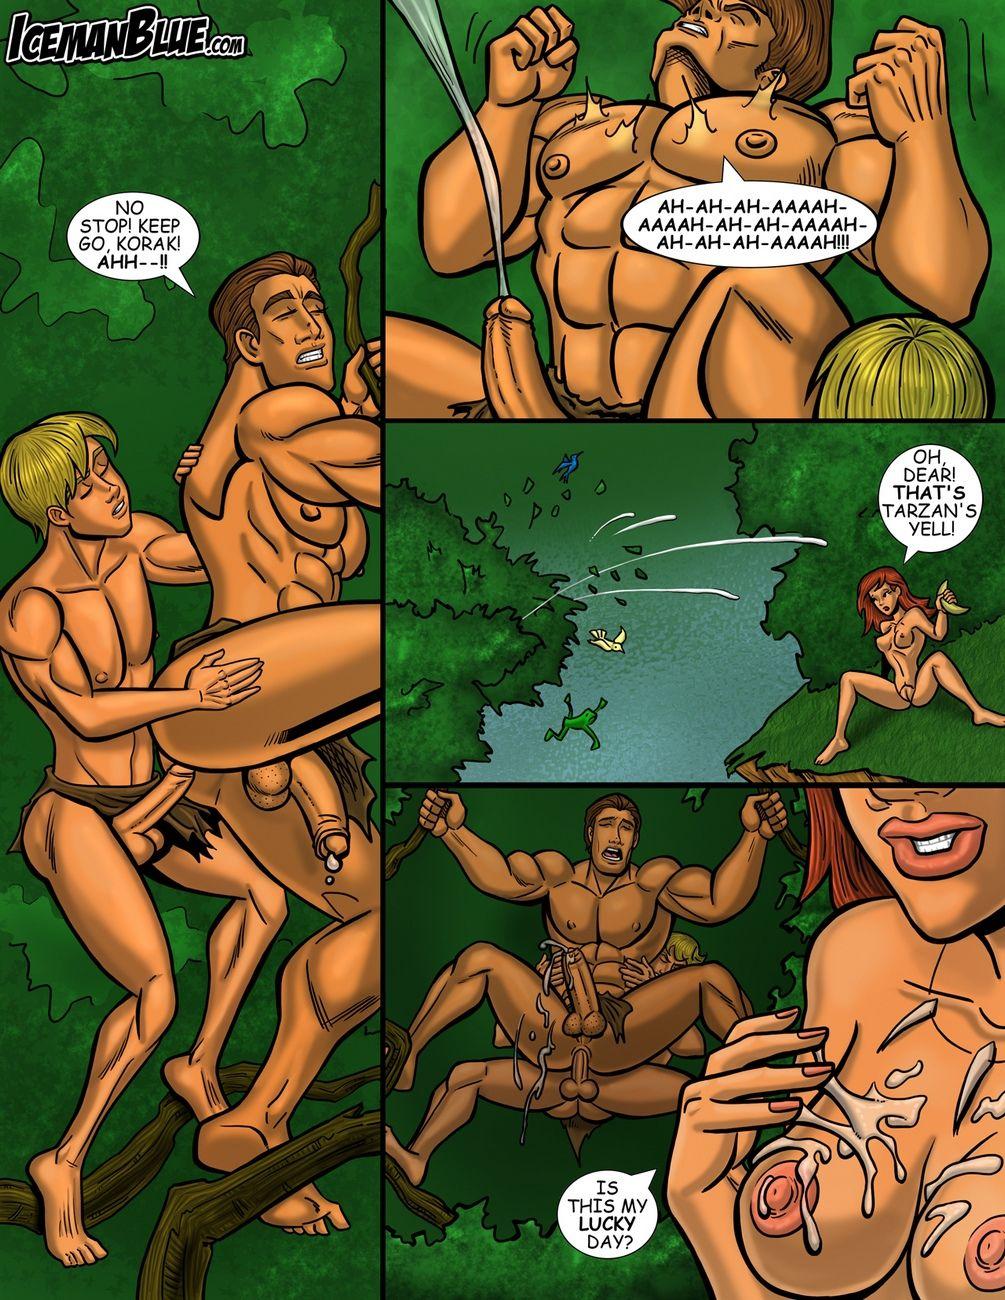 seks-komiksi-tarzan